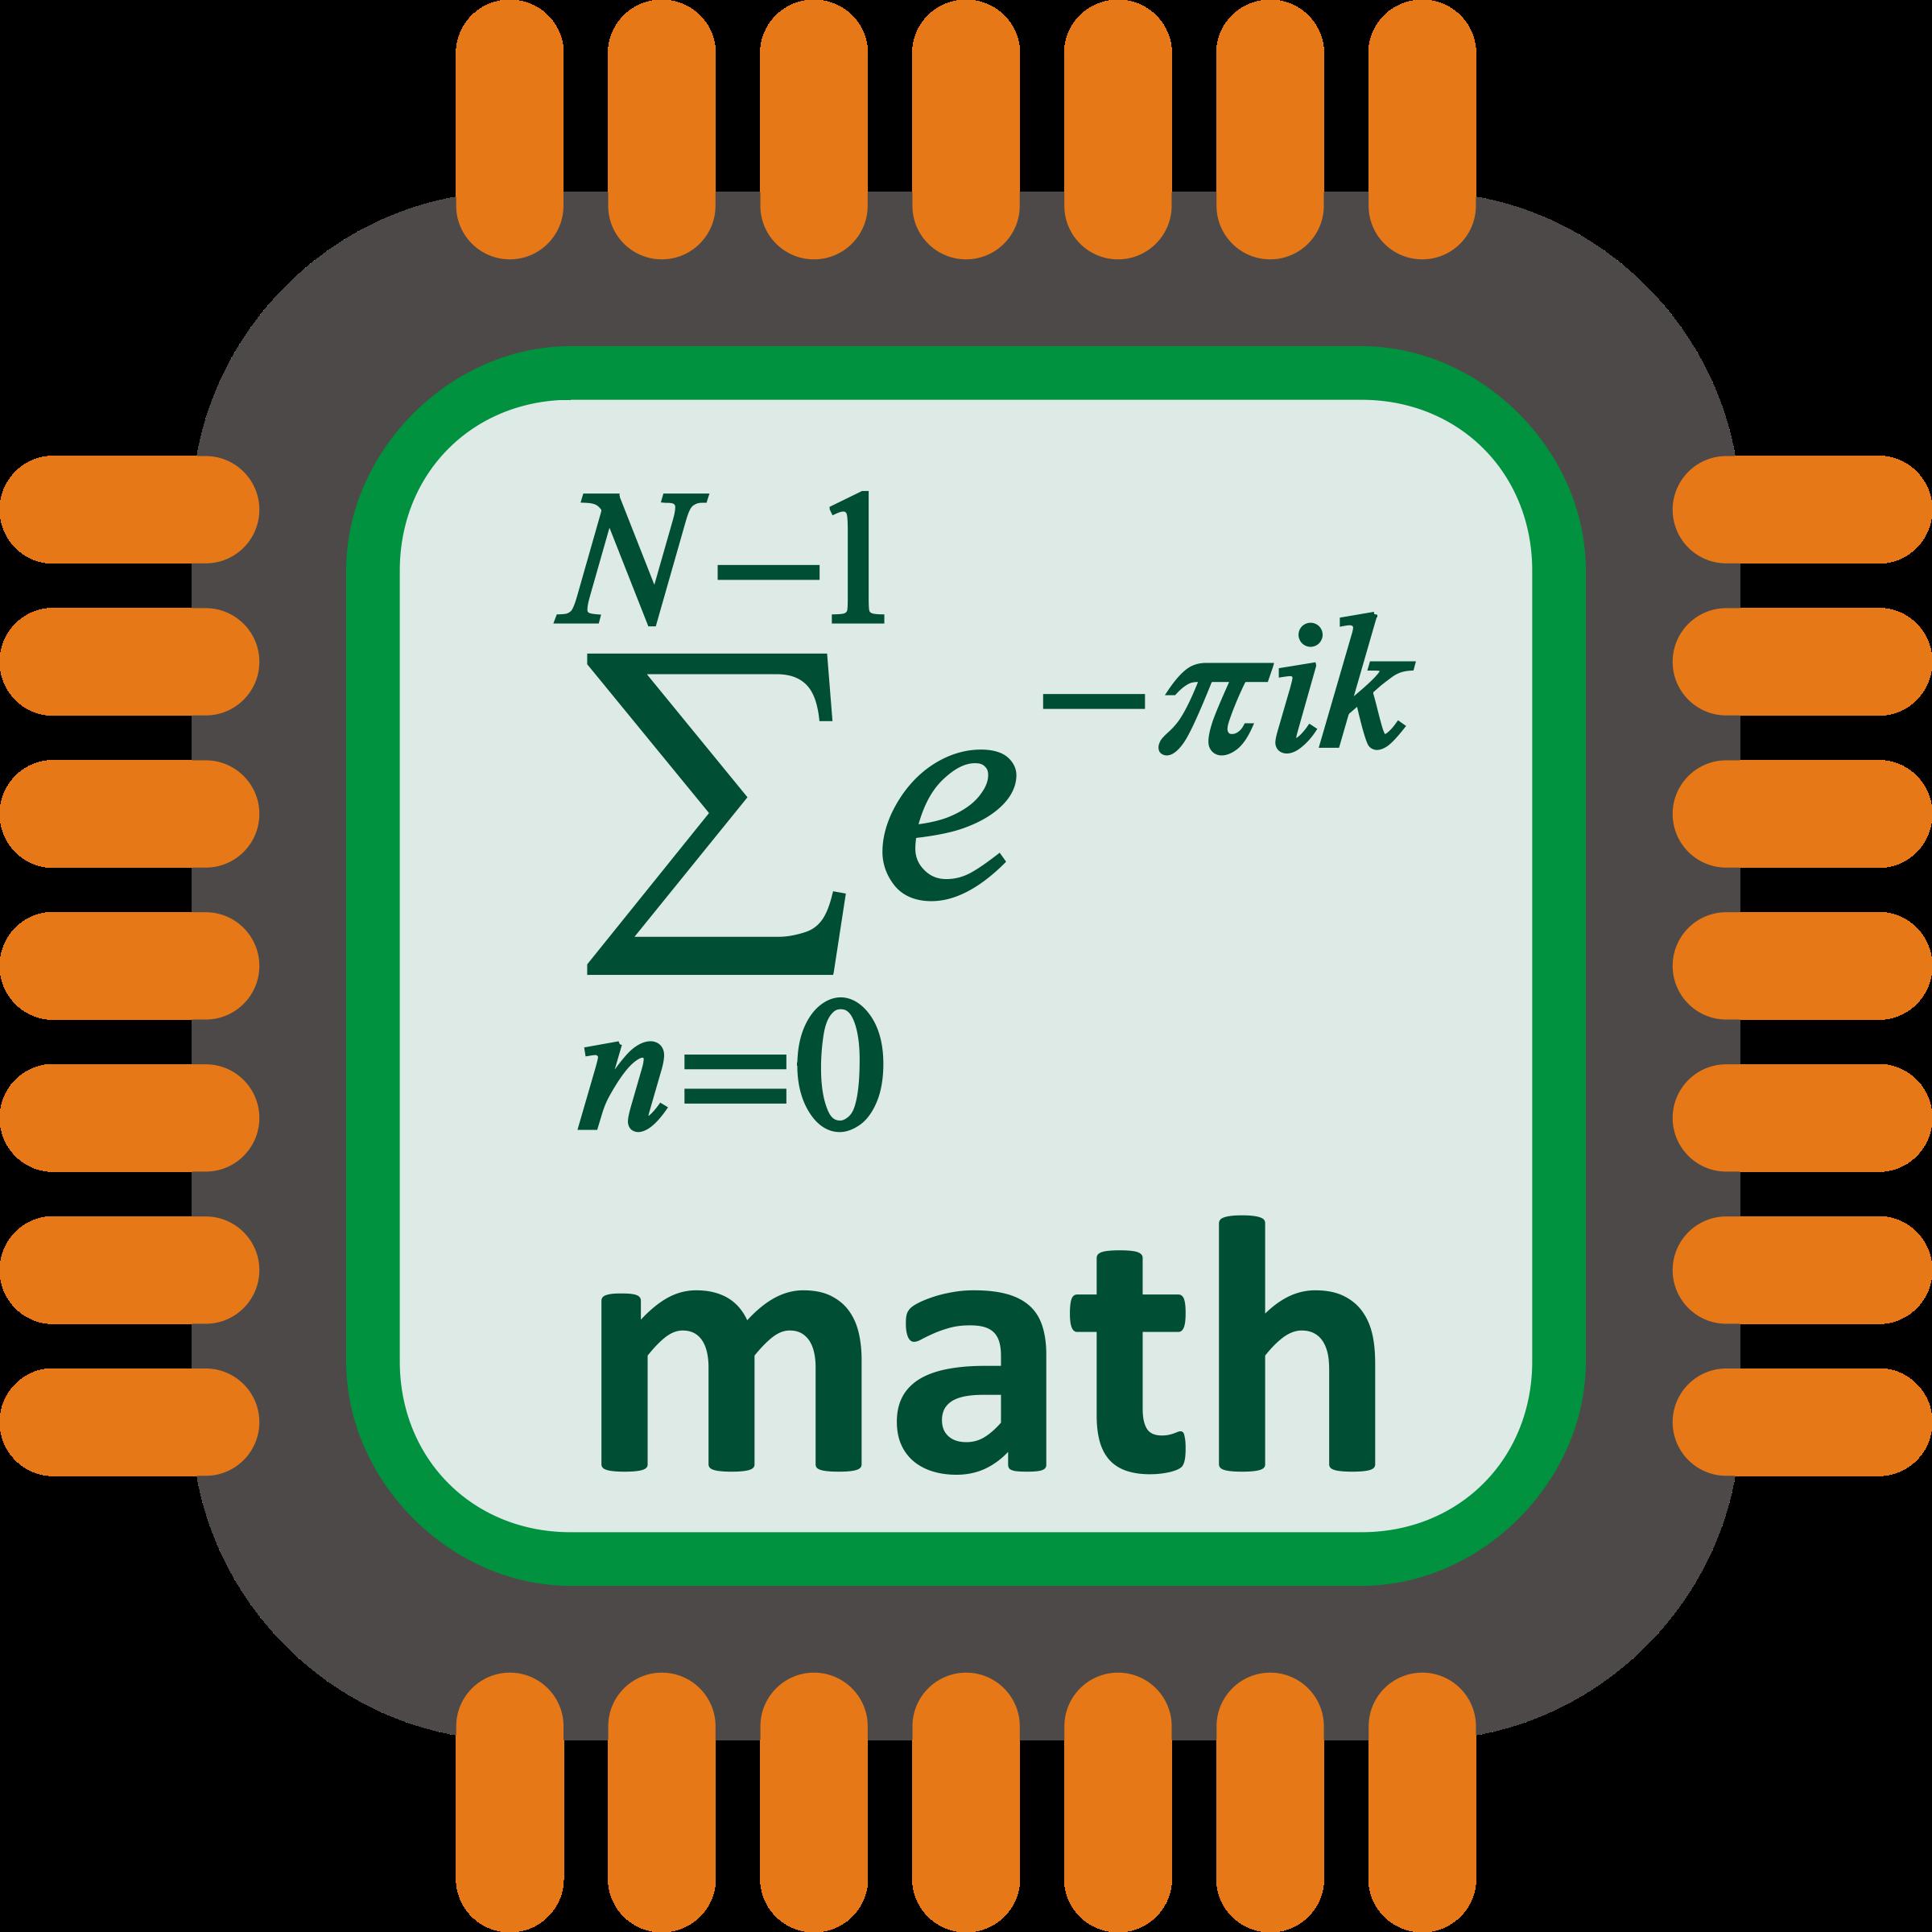 Processor big image png. Clipart people math